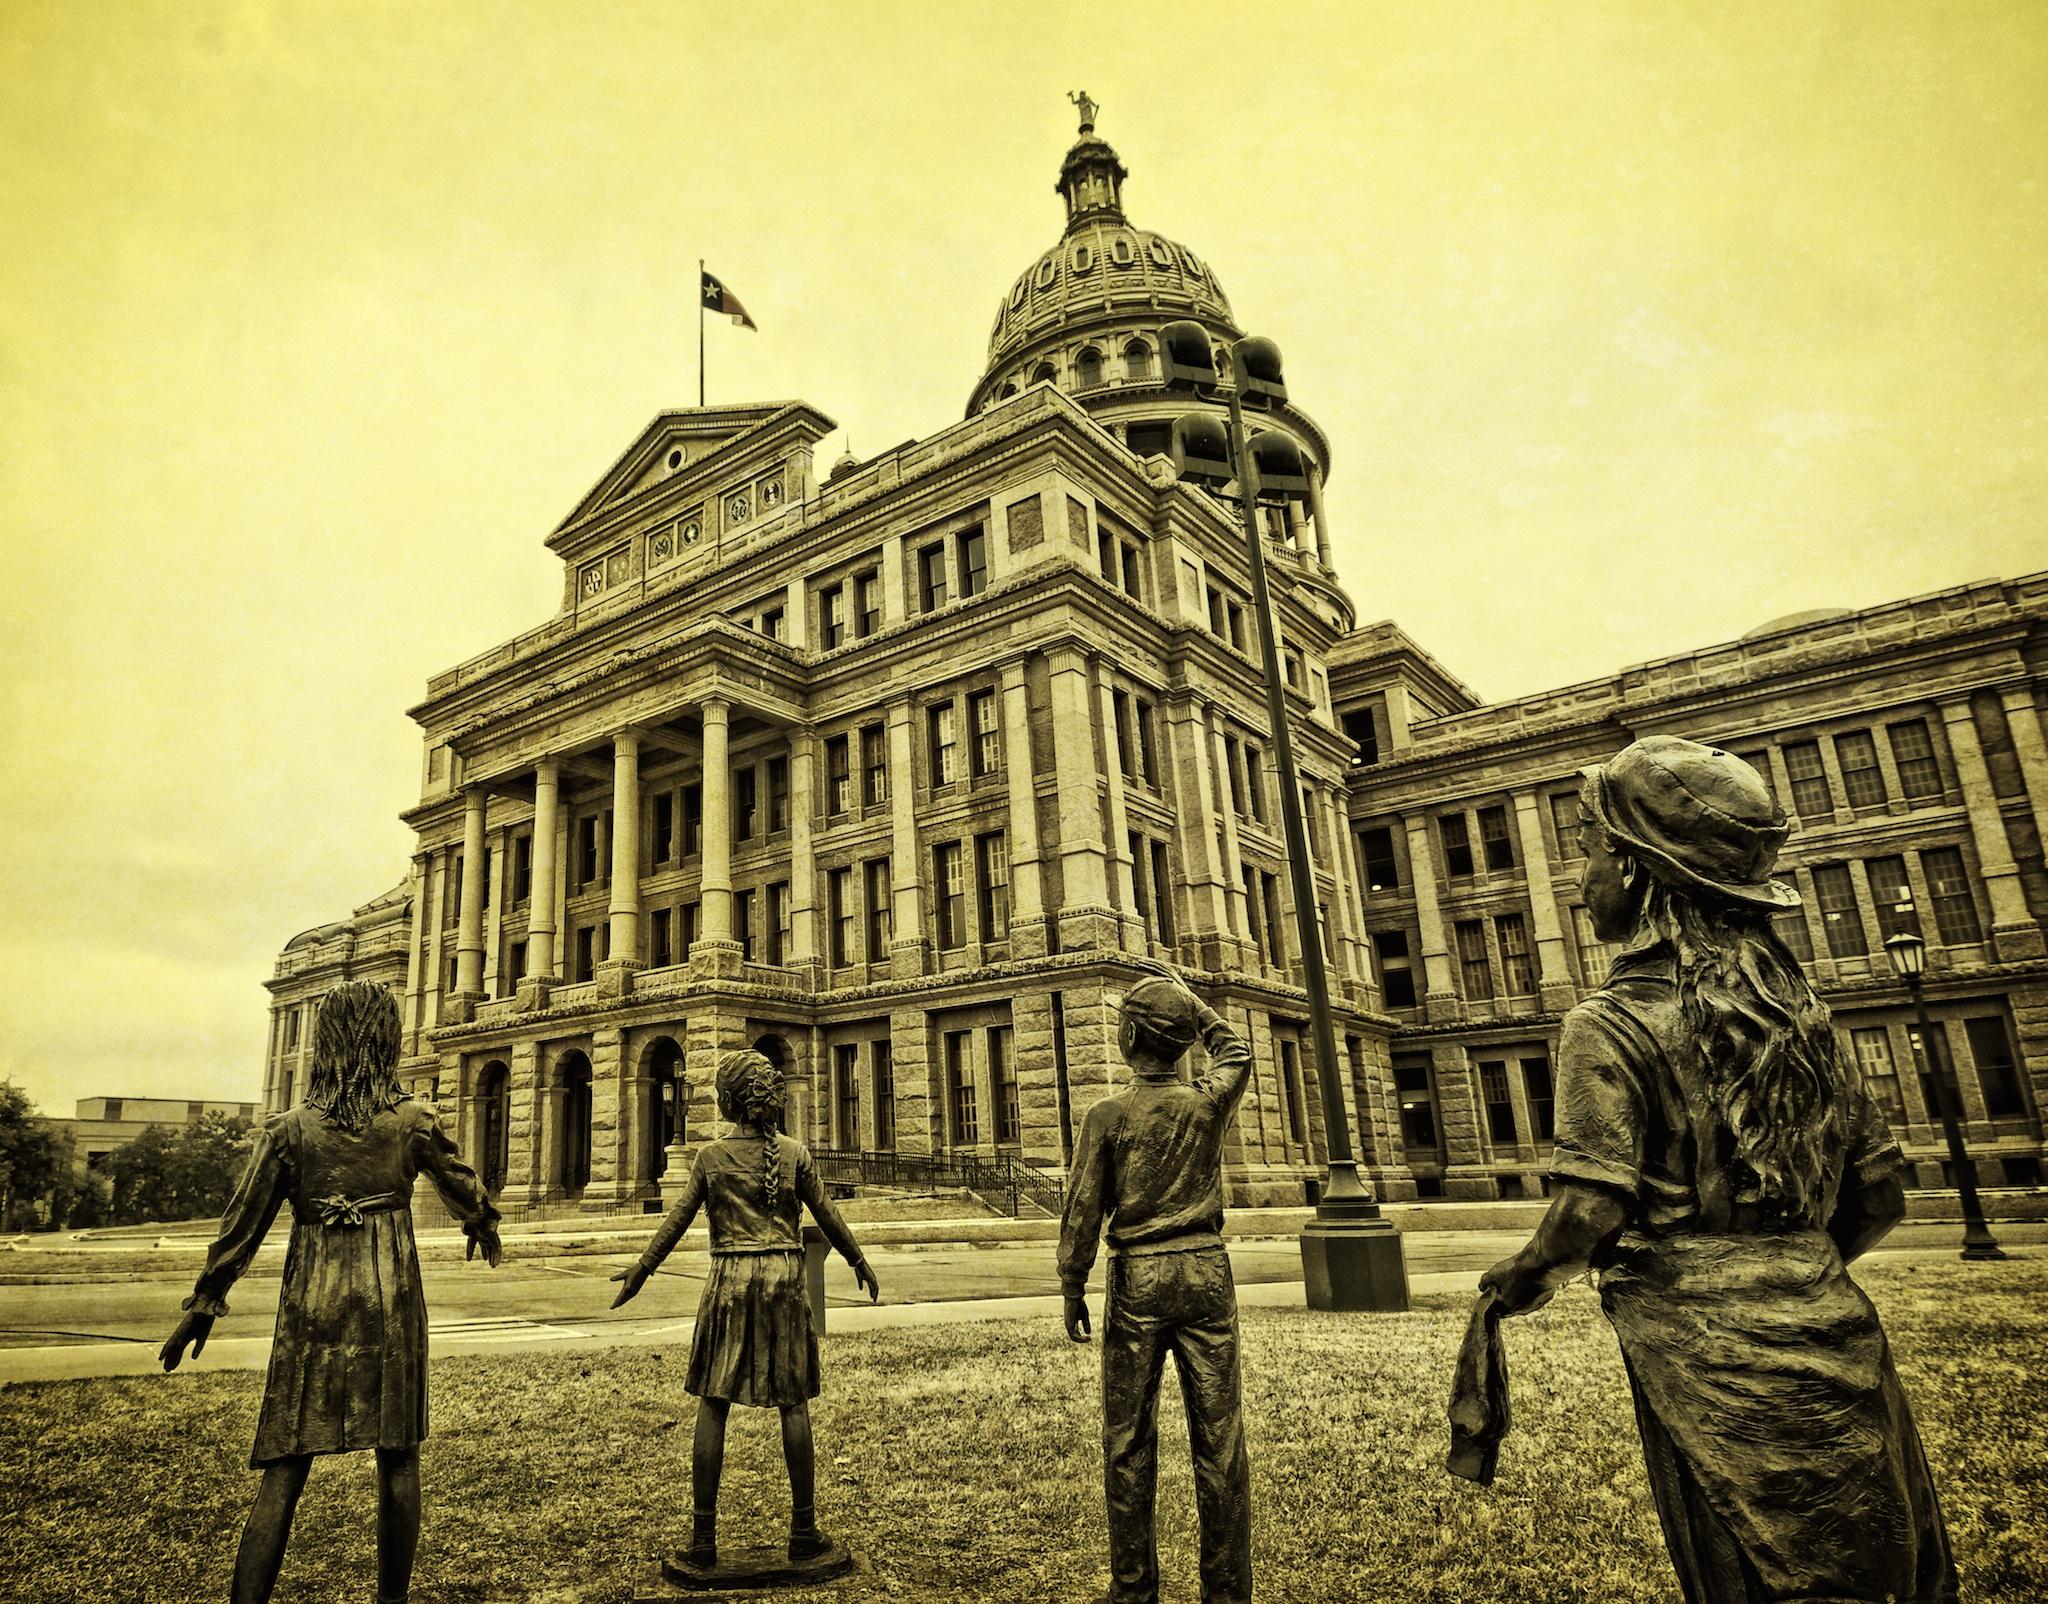 Statues | Texas State Capital Building, Austin, Texas